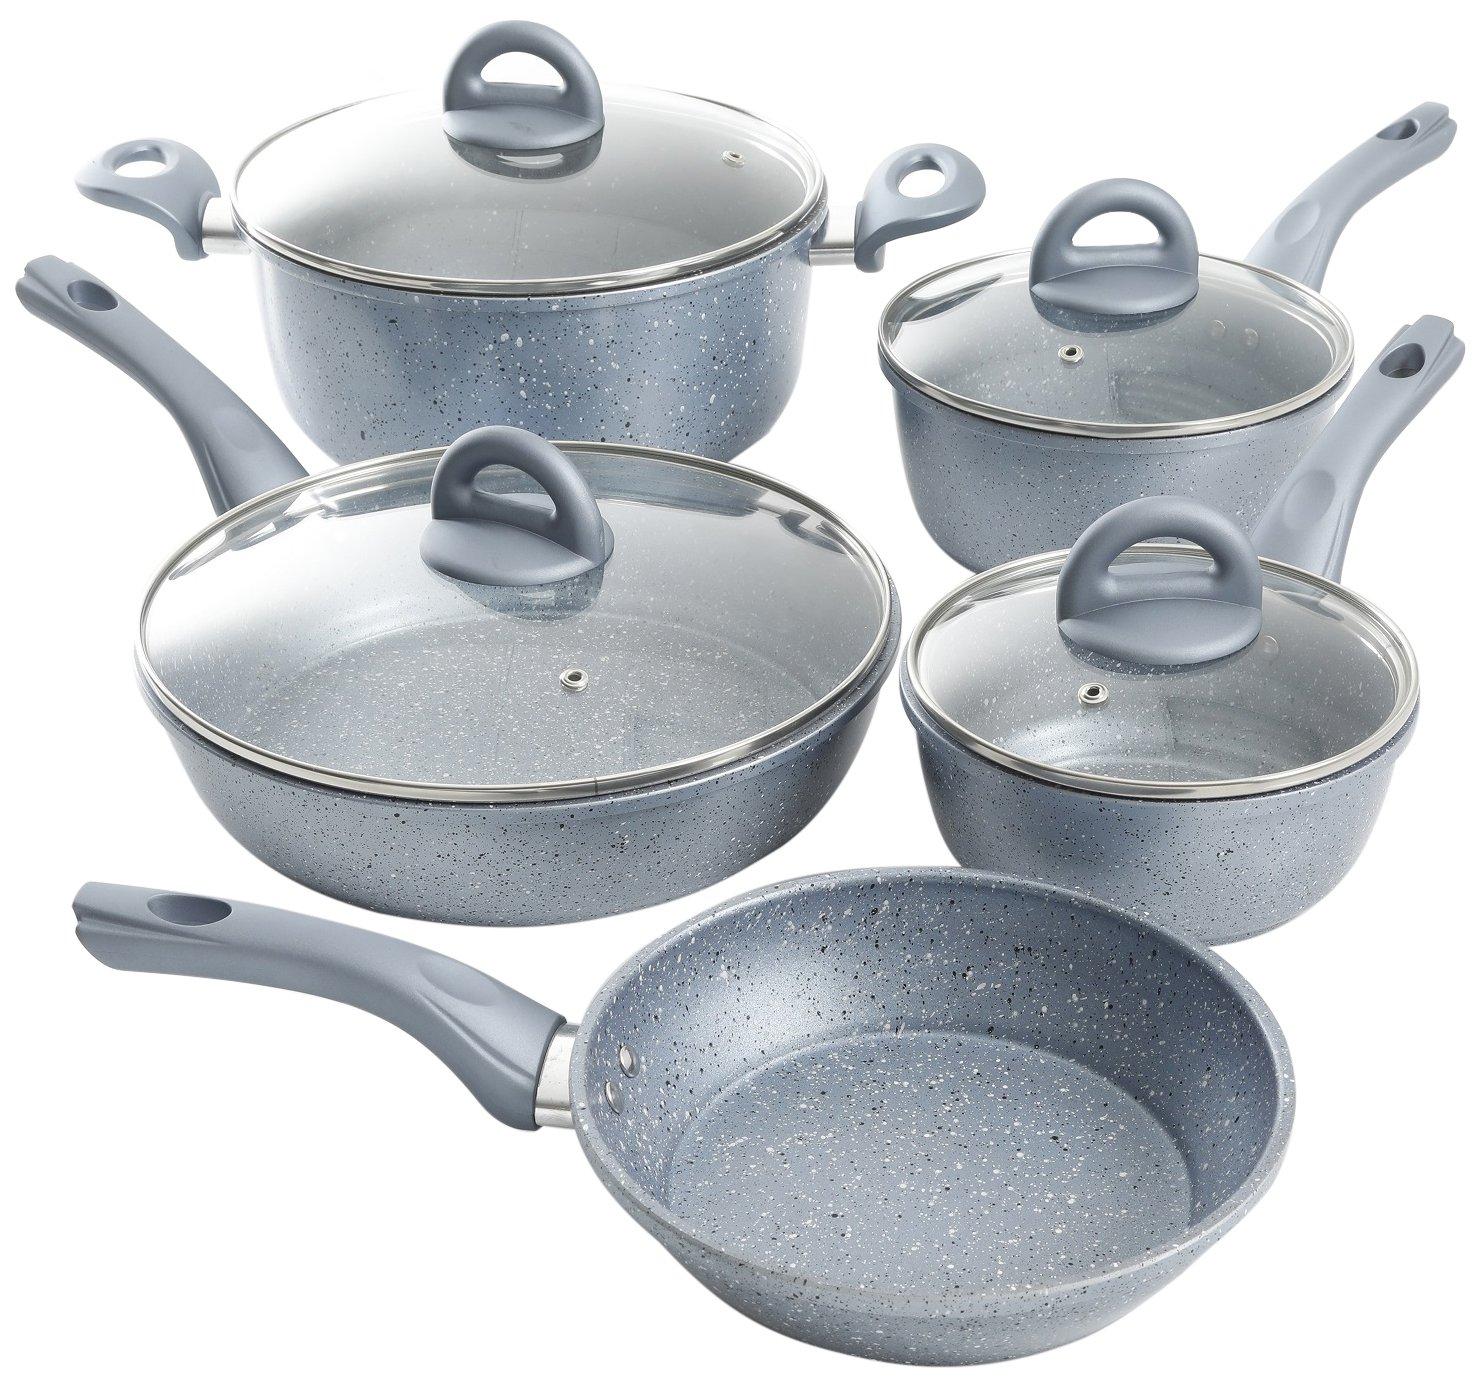 Oster 111937.09 Havendale 9 Piece Non-Stick Cookware Set, Aluminum